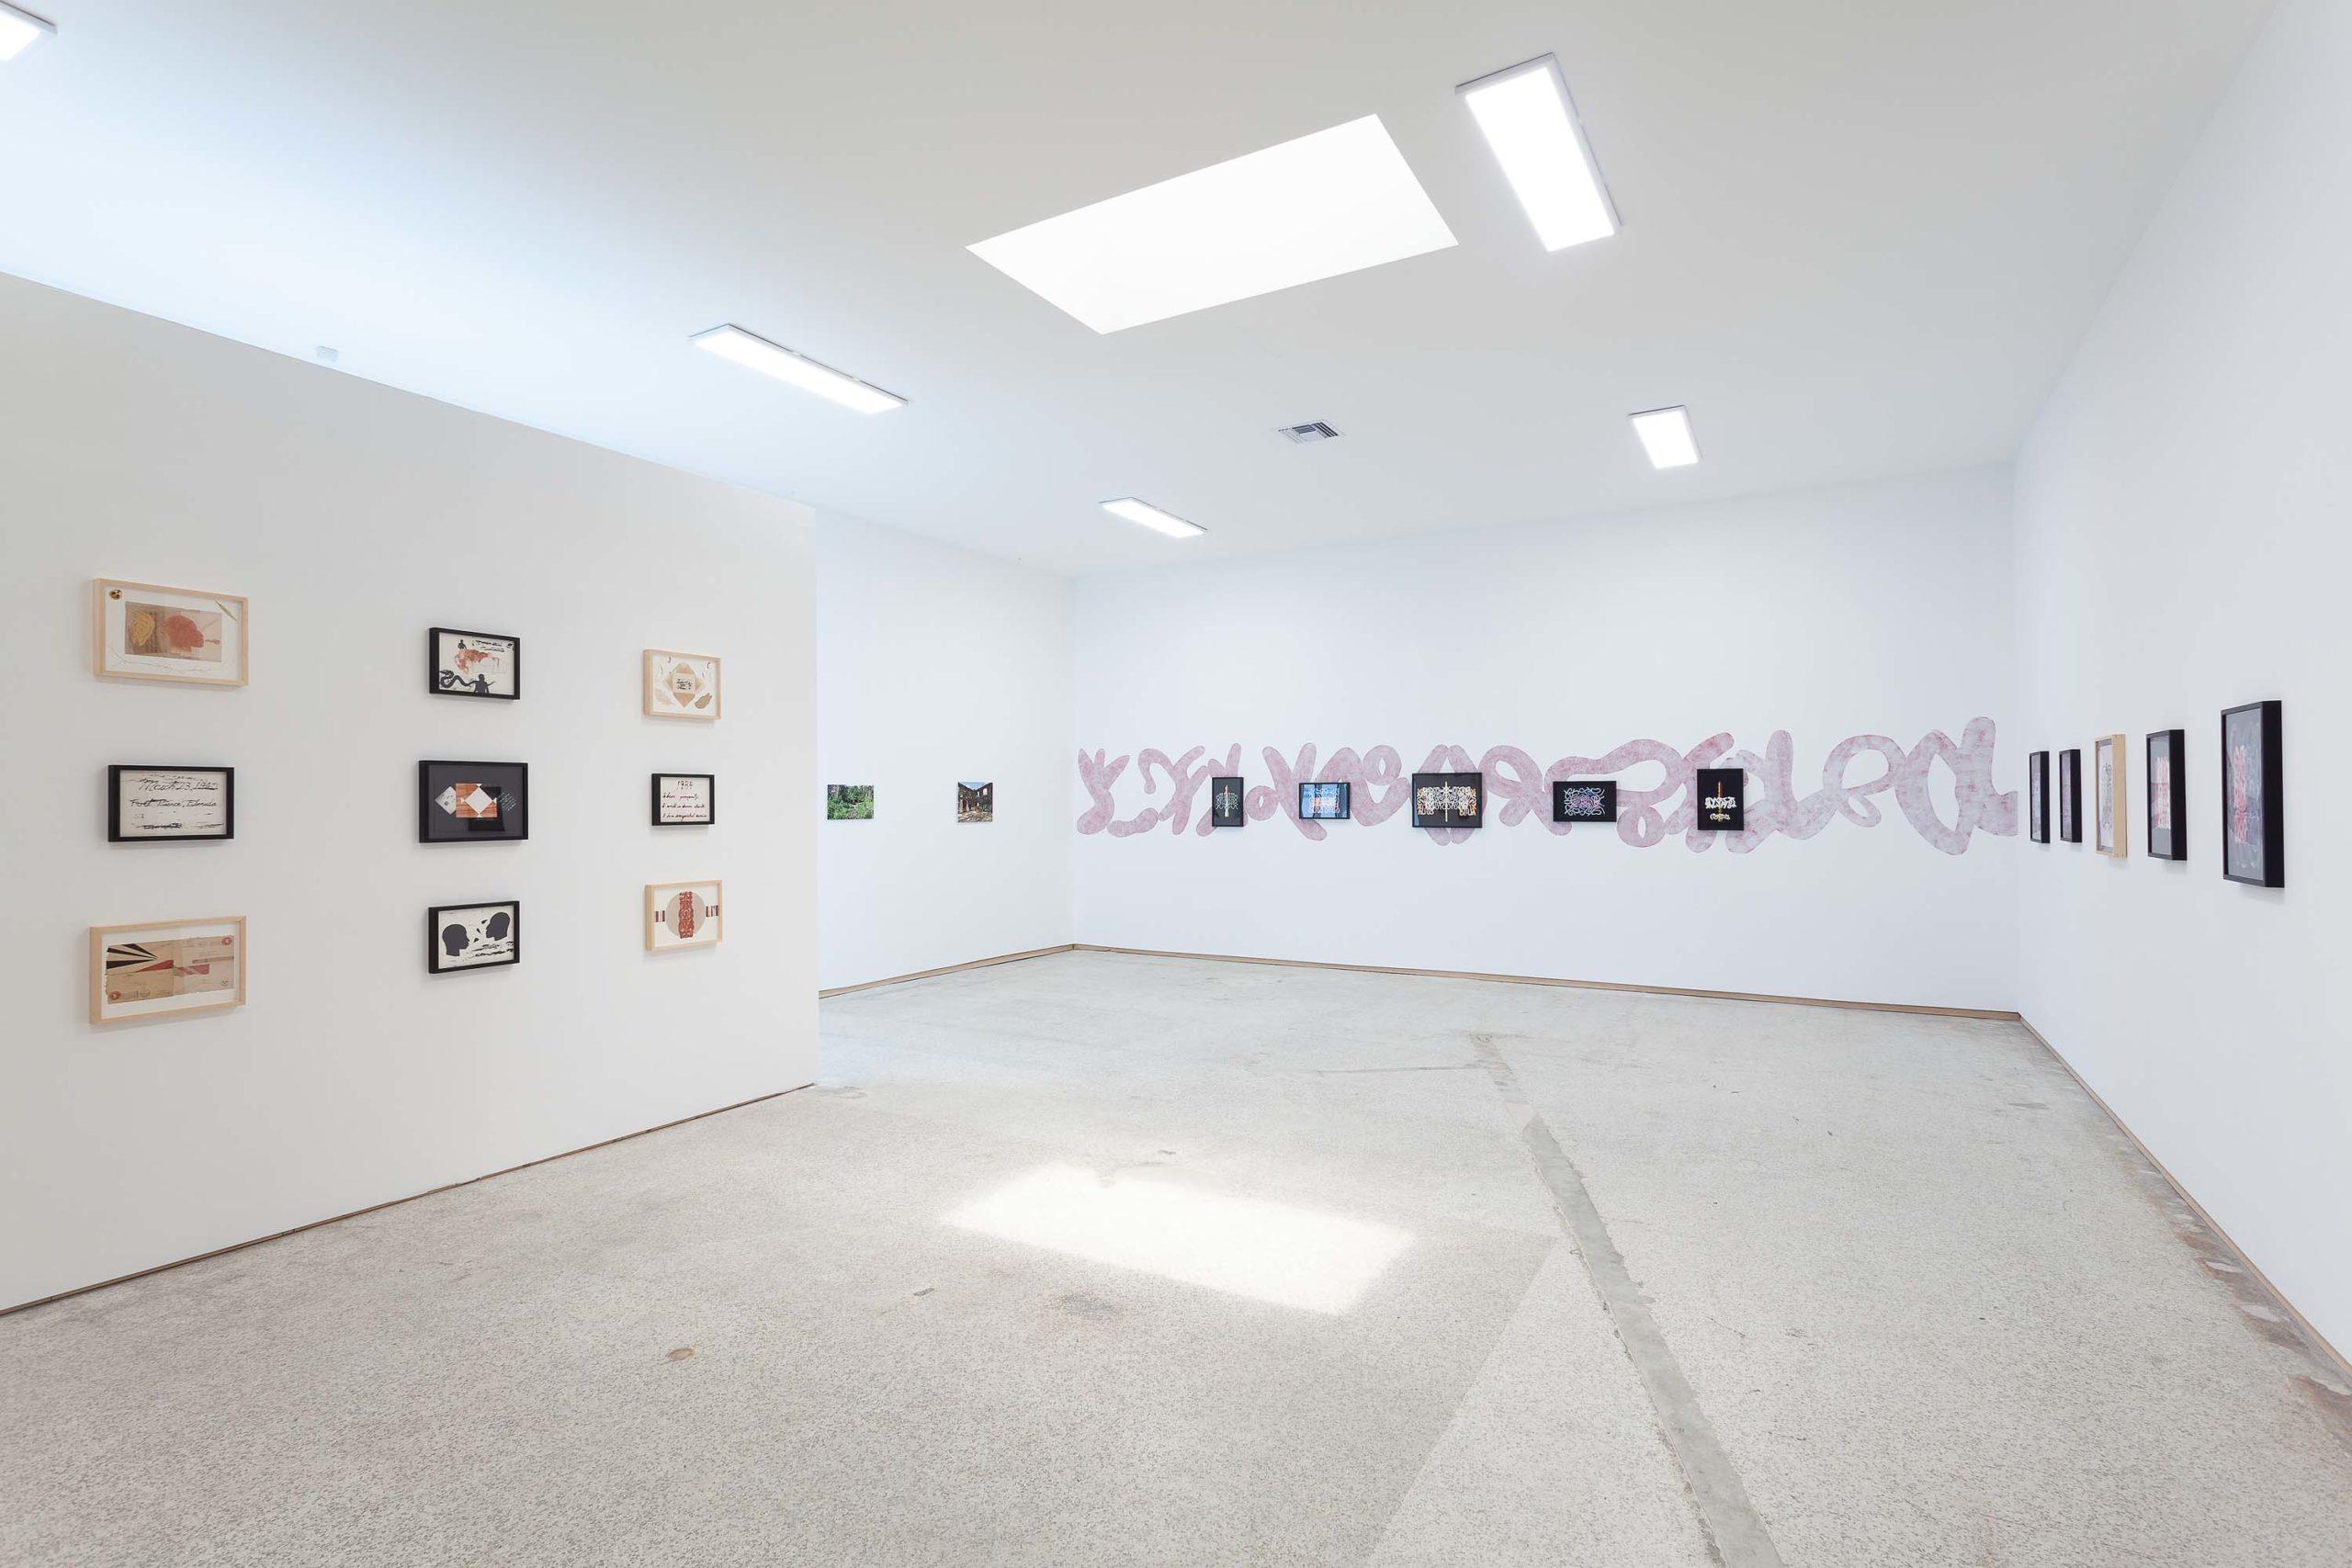 Onajide Shabaka, Alosúgbe: a journey across time (installation view)